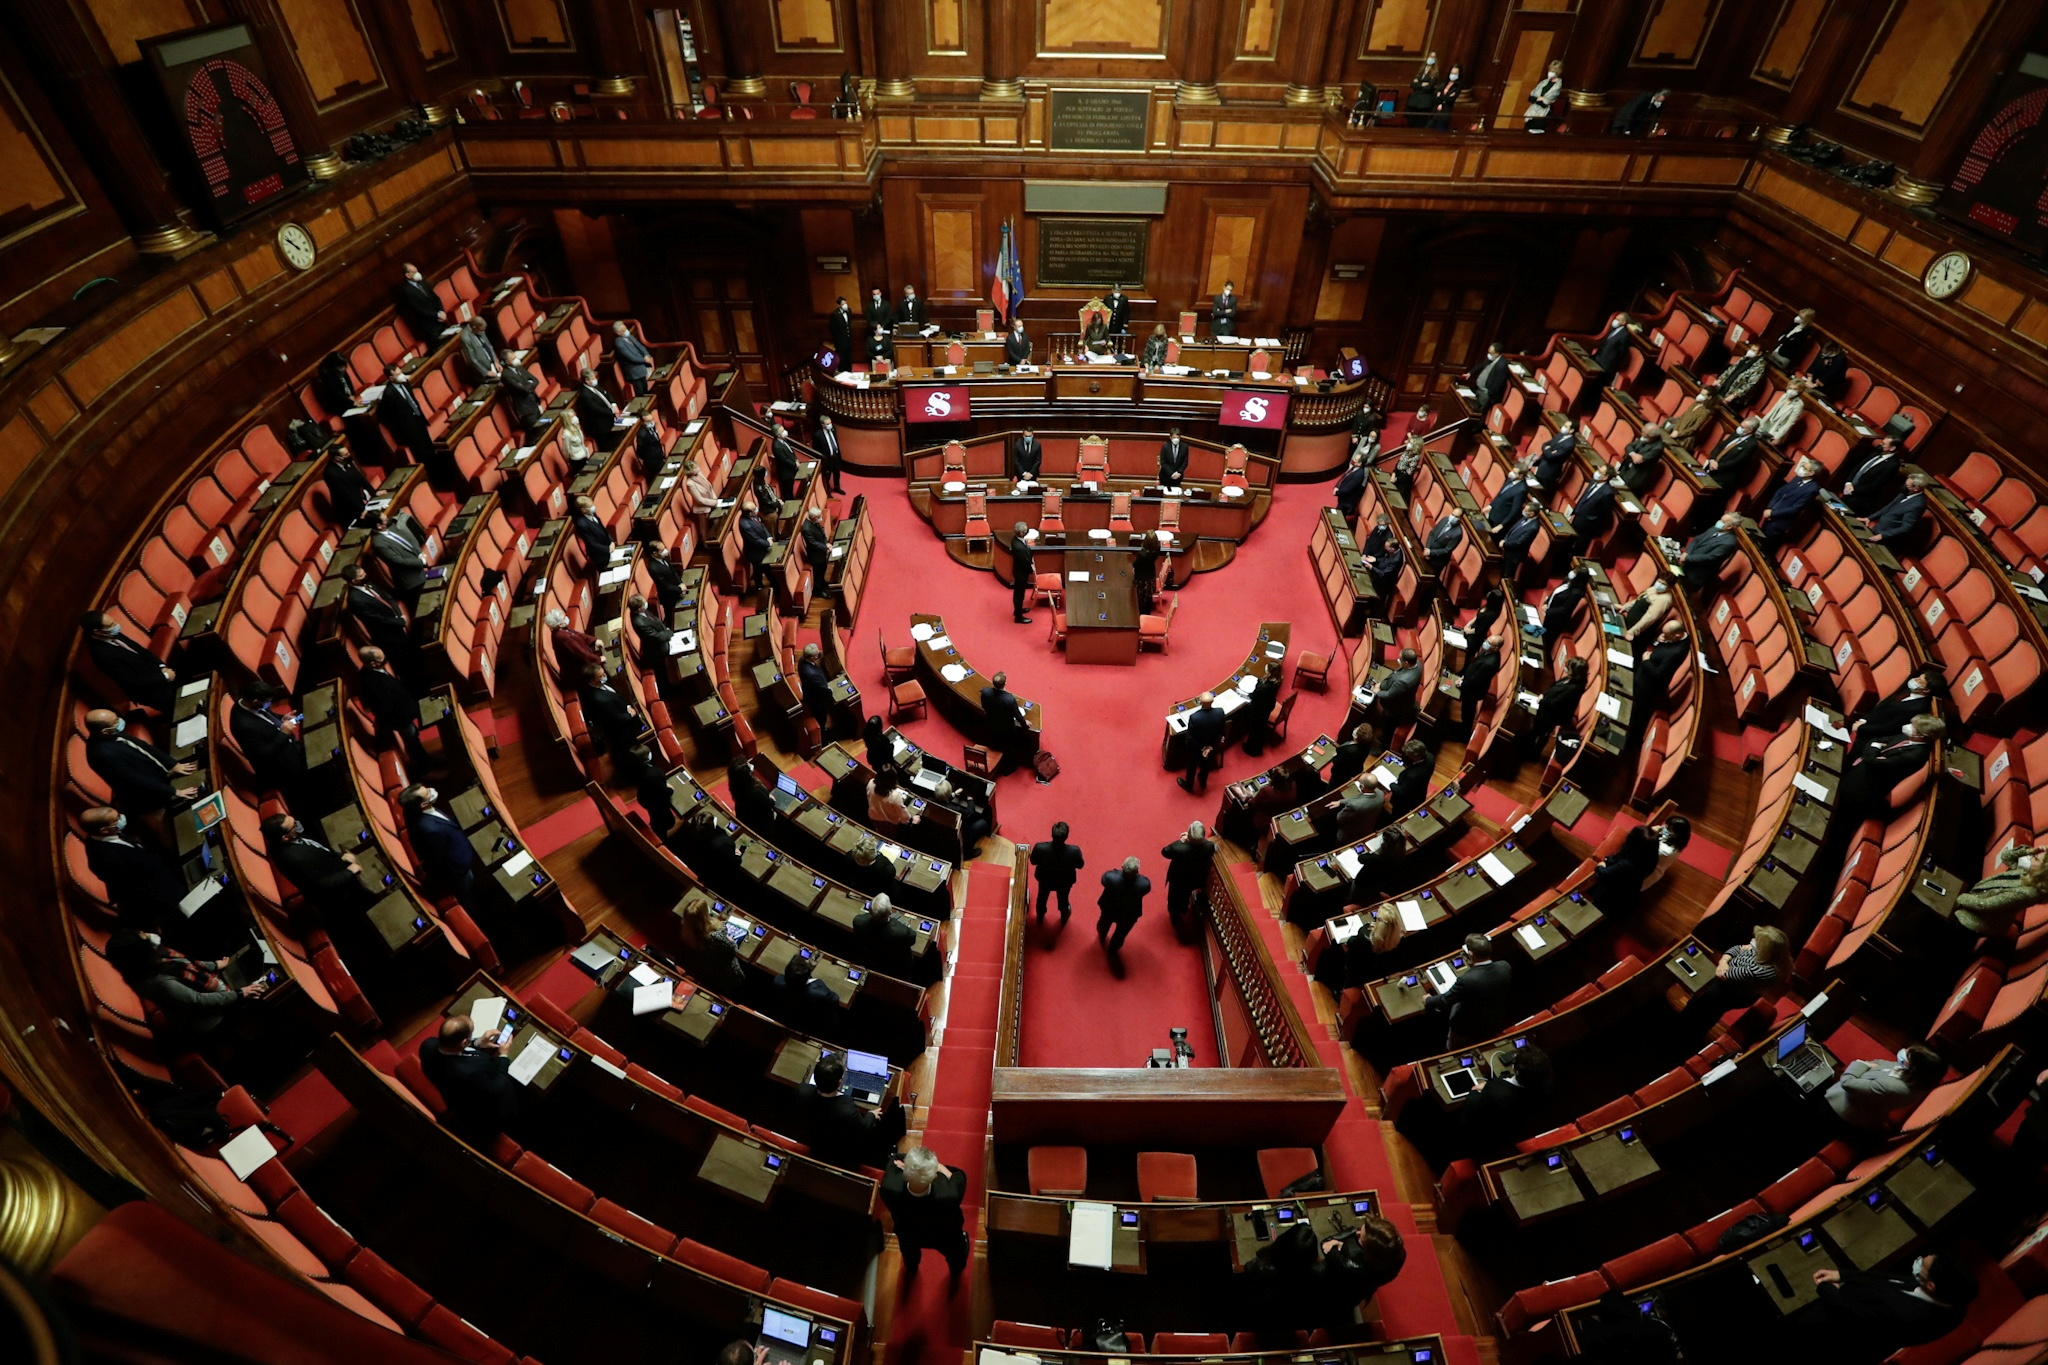 H ιταλική Βουλή επικύρωσε τη συμφωνία Ιταλίας – Ελλάδας για την οριοθέτηση των θαλάσσιων ζωνών